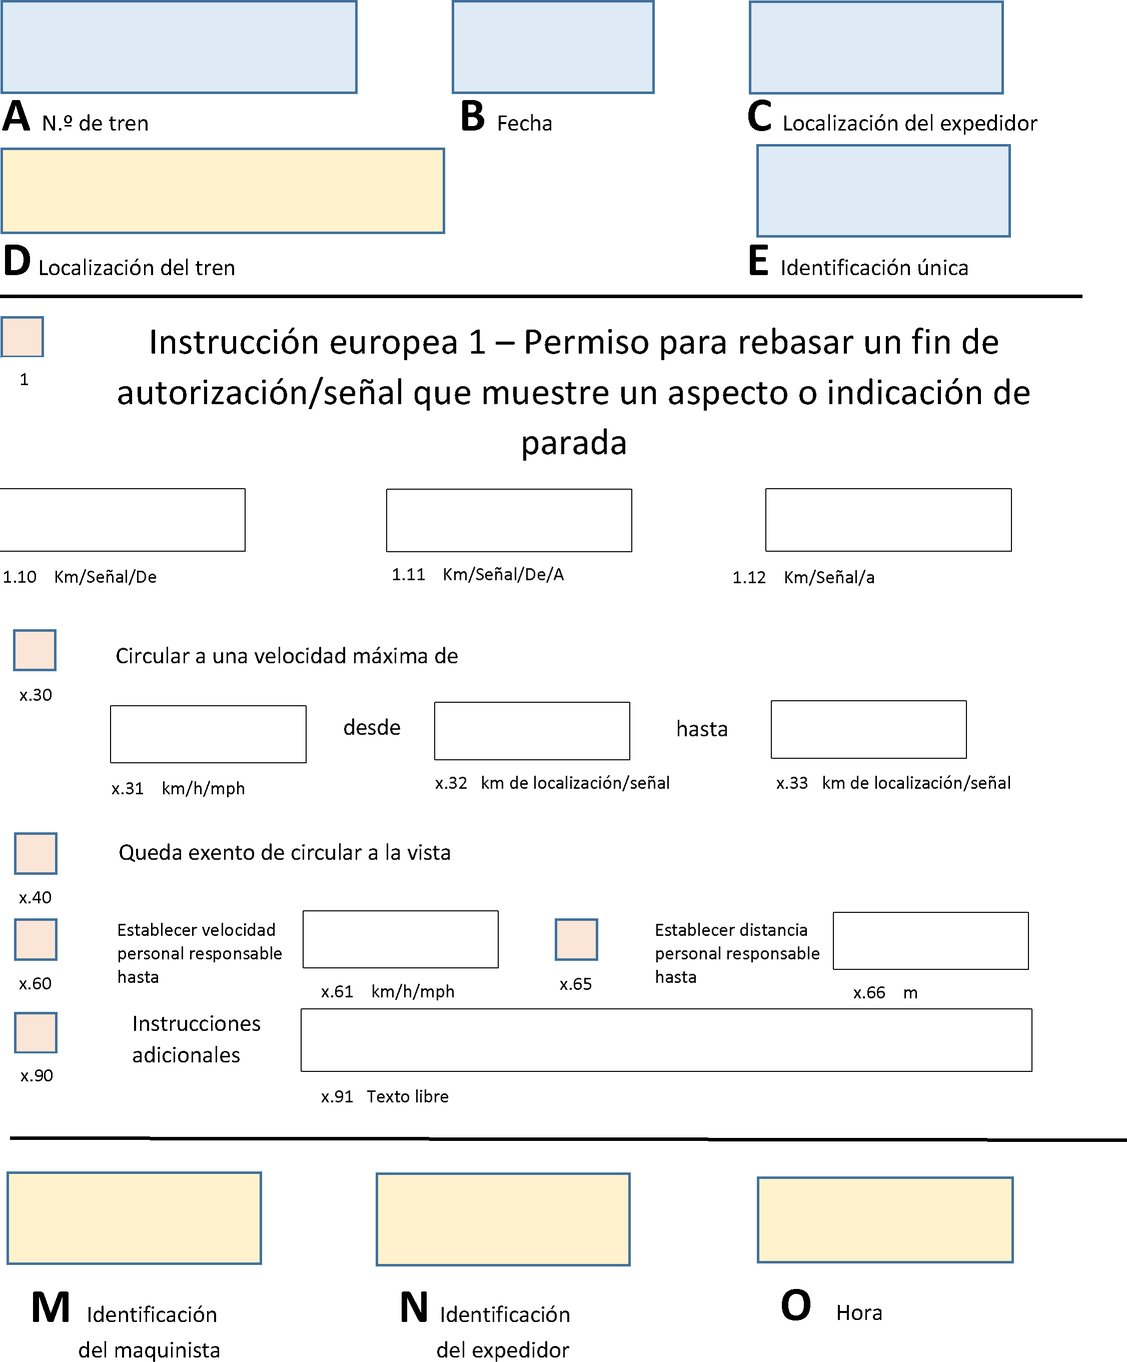 Imagen: https://eur-lex.europa.eu/resource.html?uri=uriserv:OJ.LI.2019.139.01.0005.01.SPA.xhtml.LI2019139ES.01005301.tif.jpg